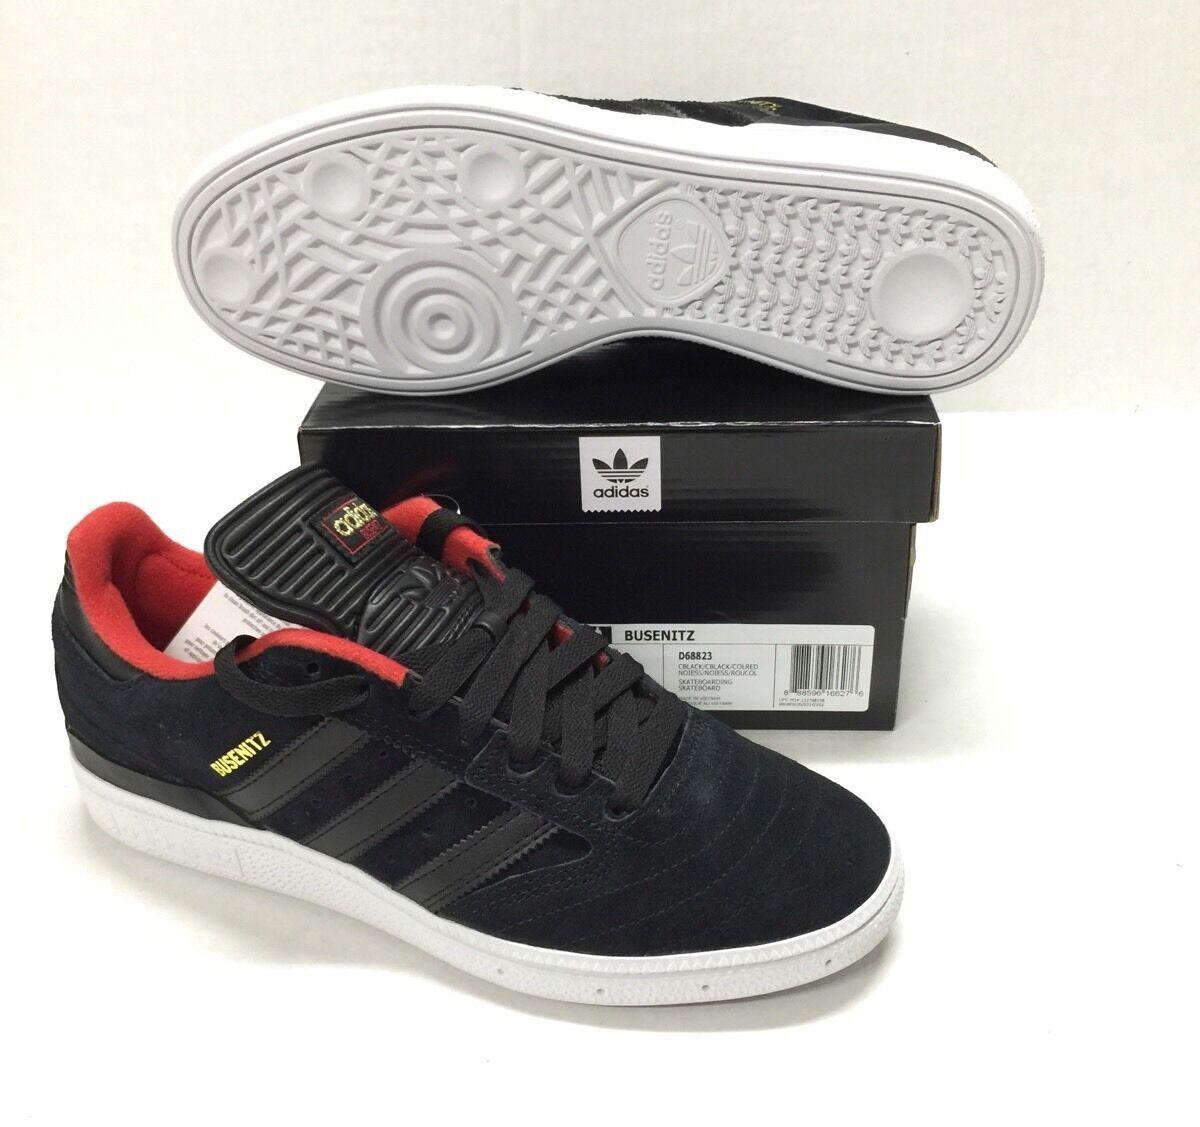 ADIDAS BUSENTIZ #D68823 BLACK / COLLEGIATE RED- WHITE *NEW* Great discount